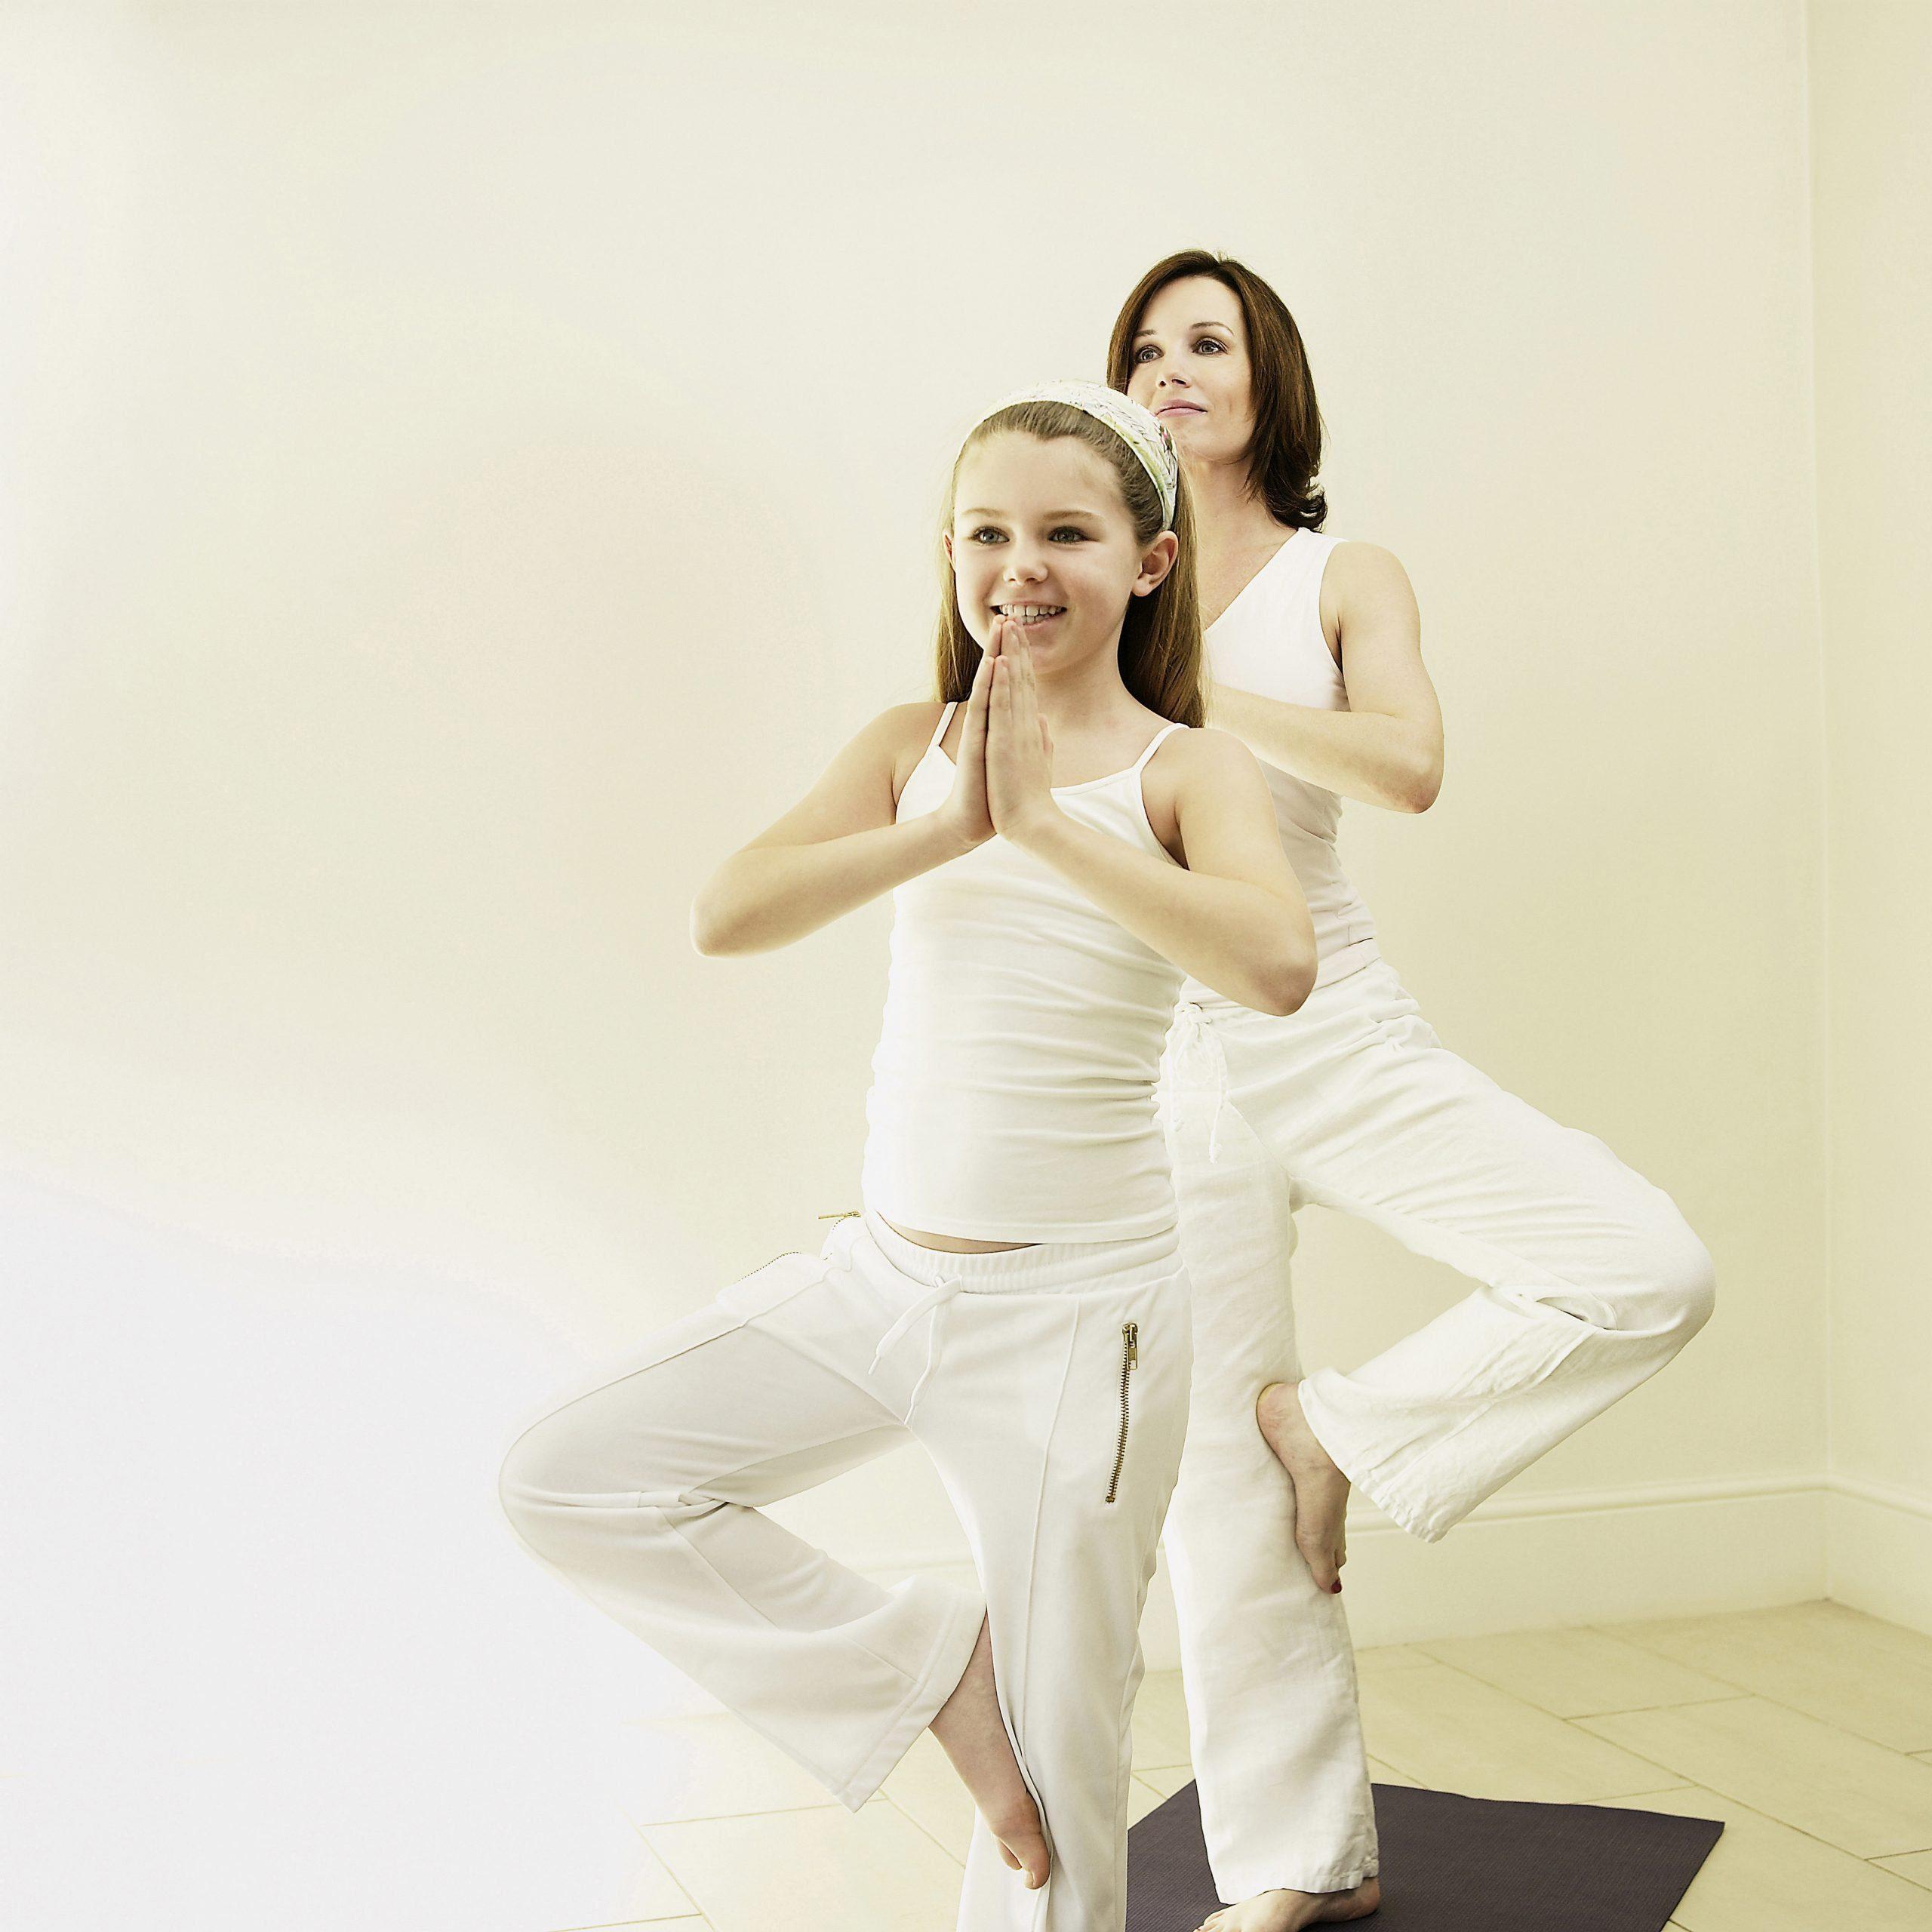 woman and daughter doing yoga